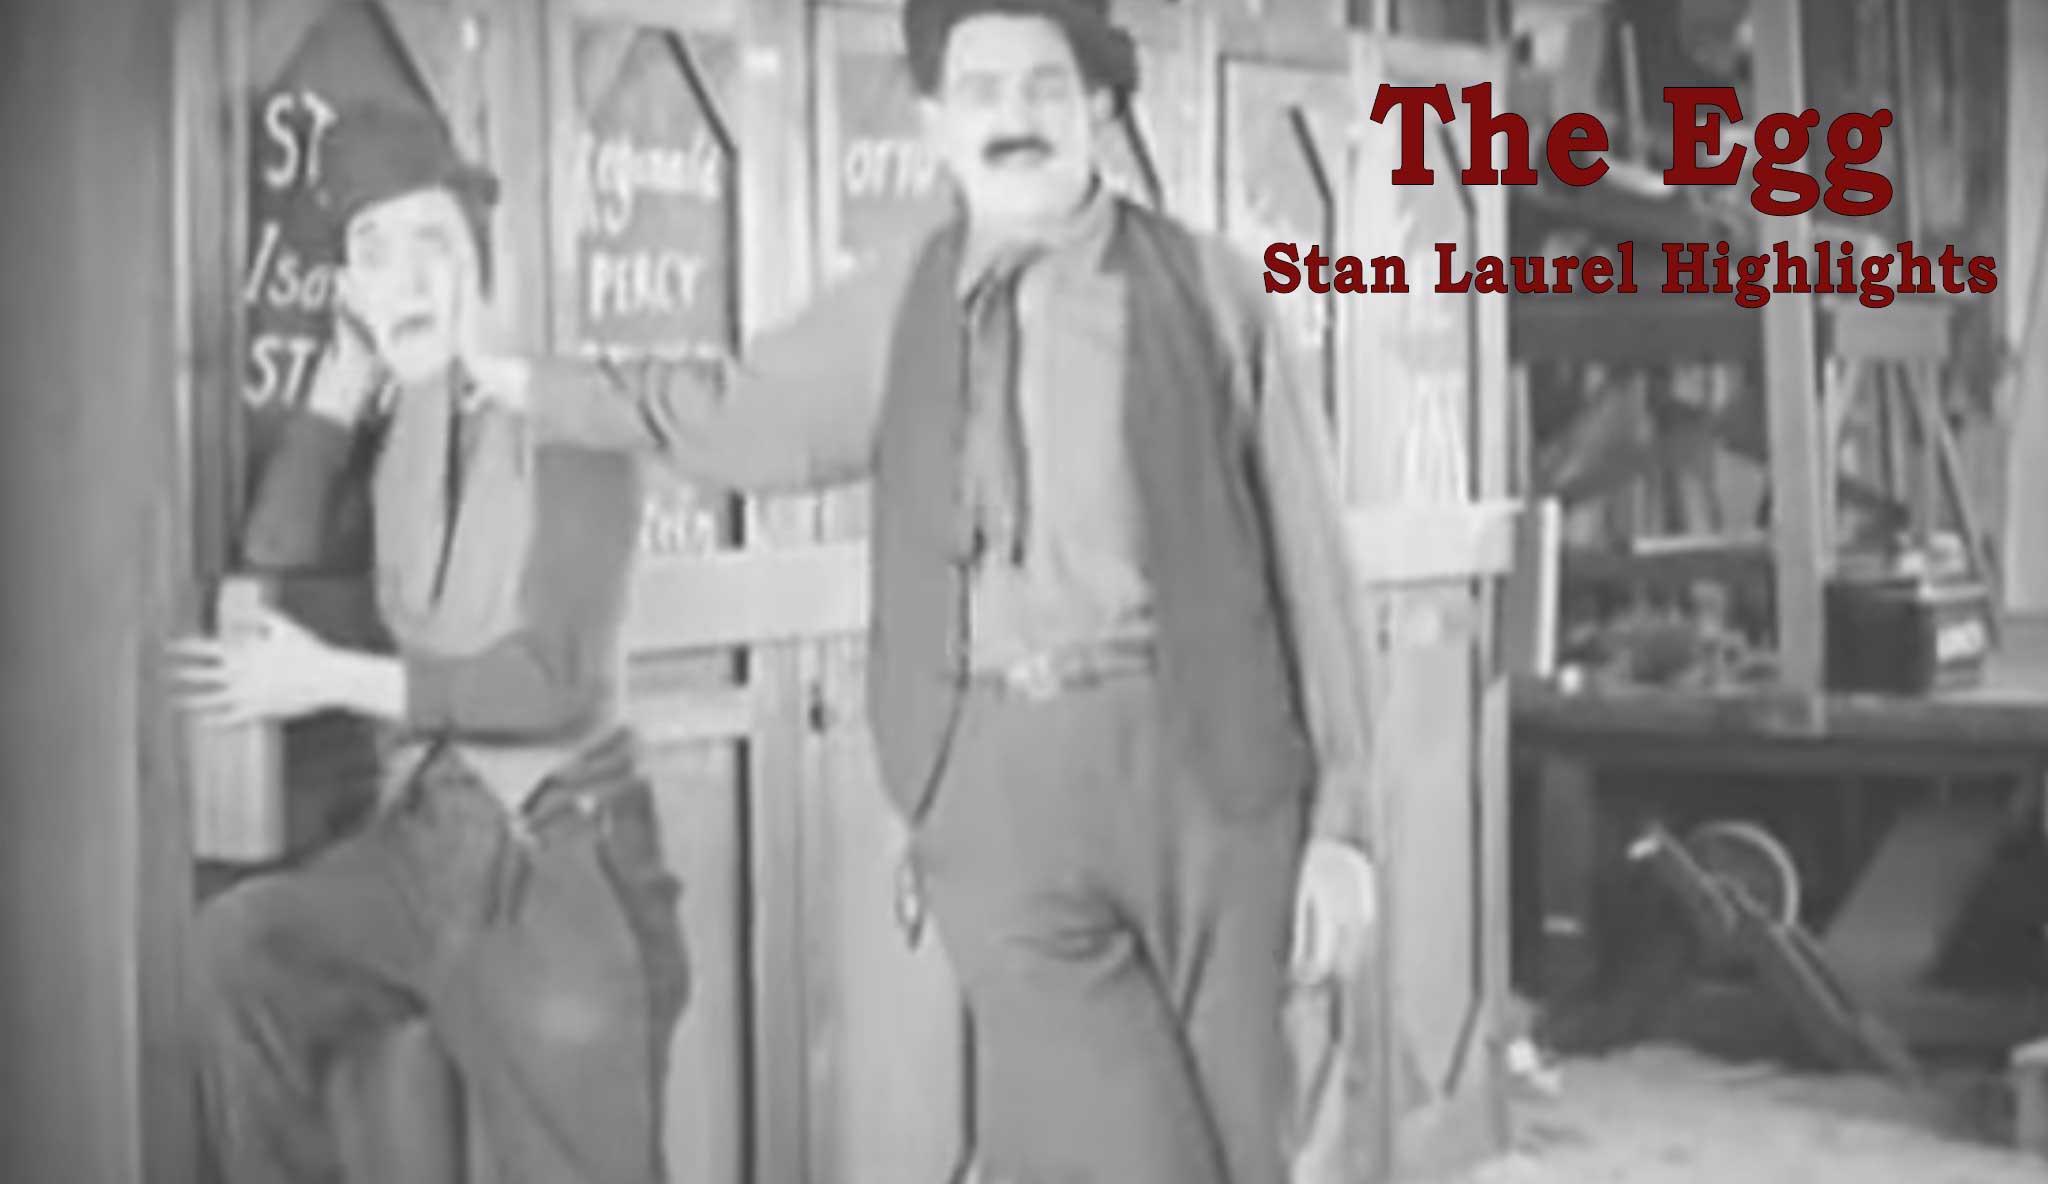 stan-laurel-highlights-the-egg\header.jpg